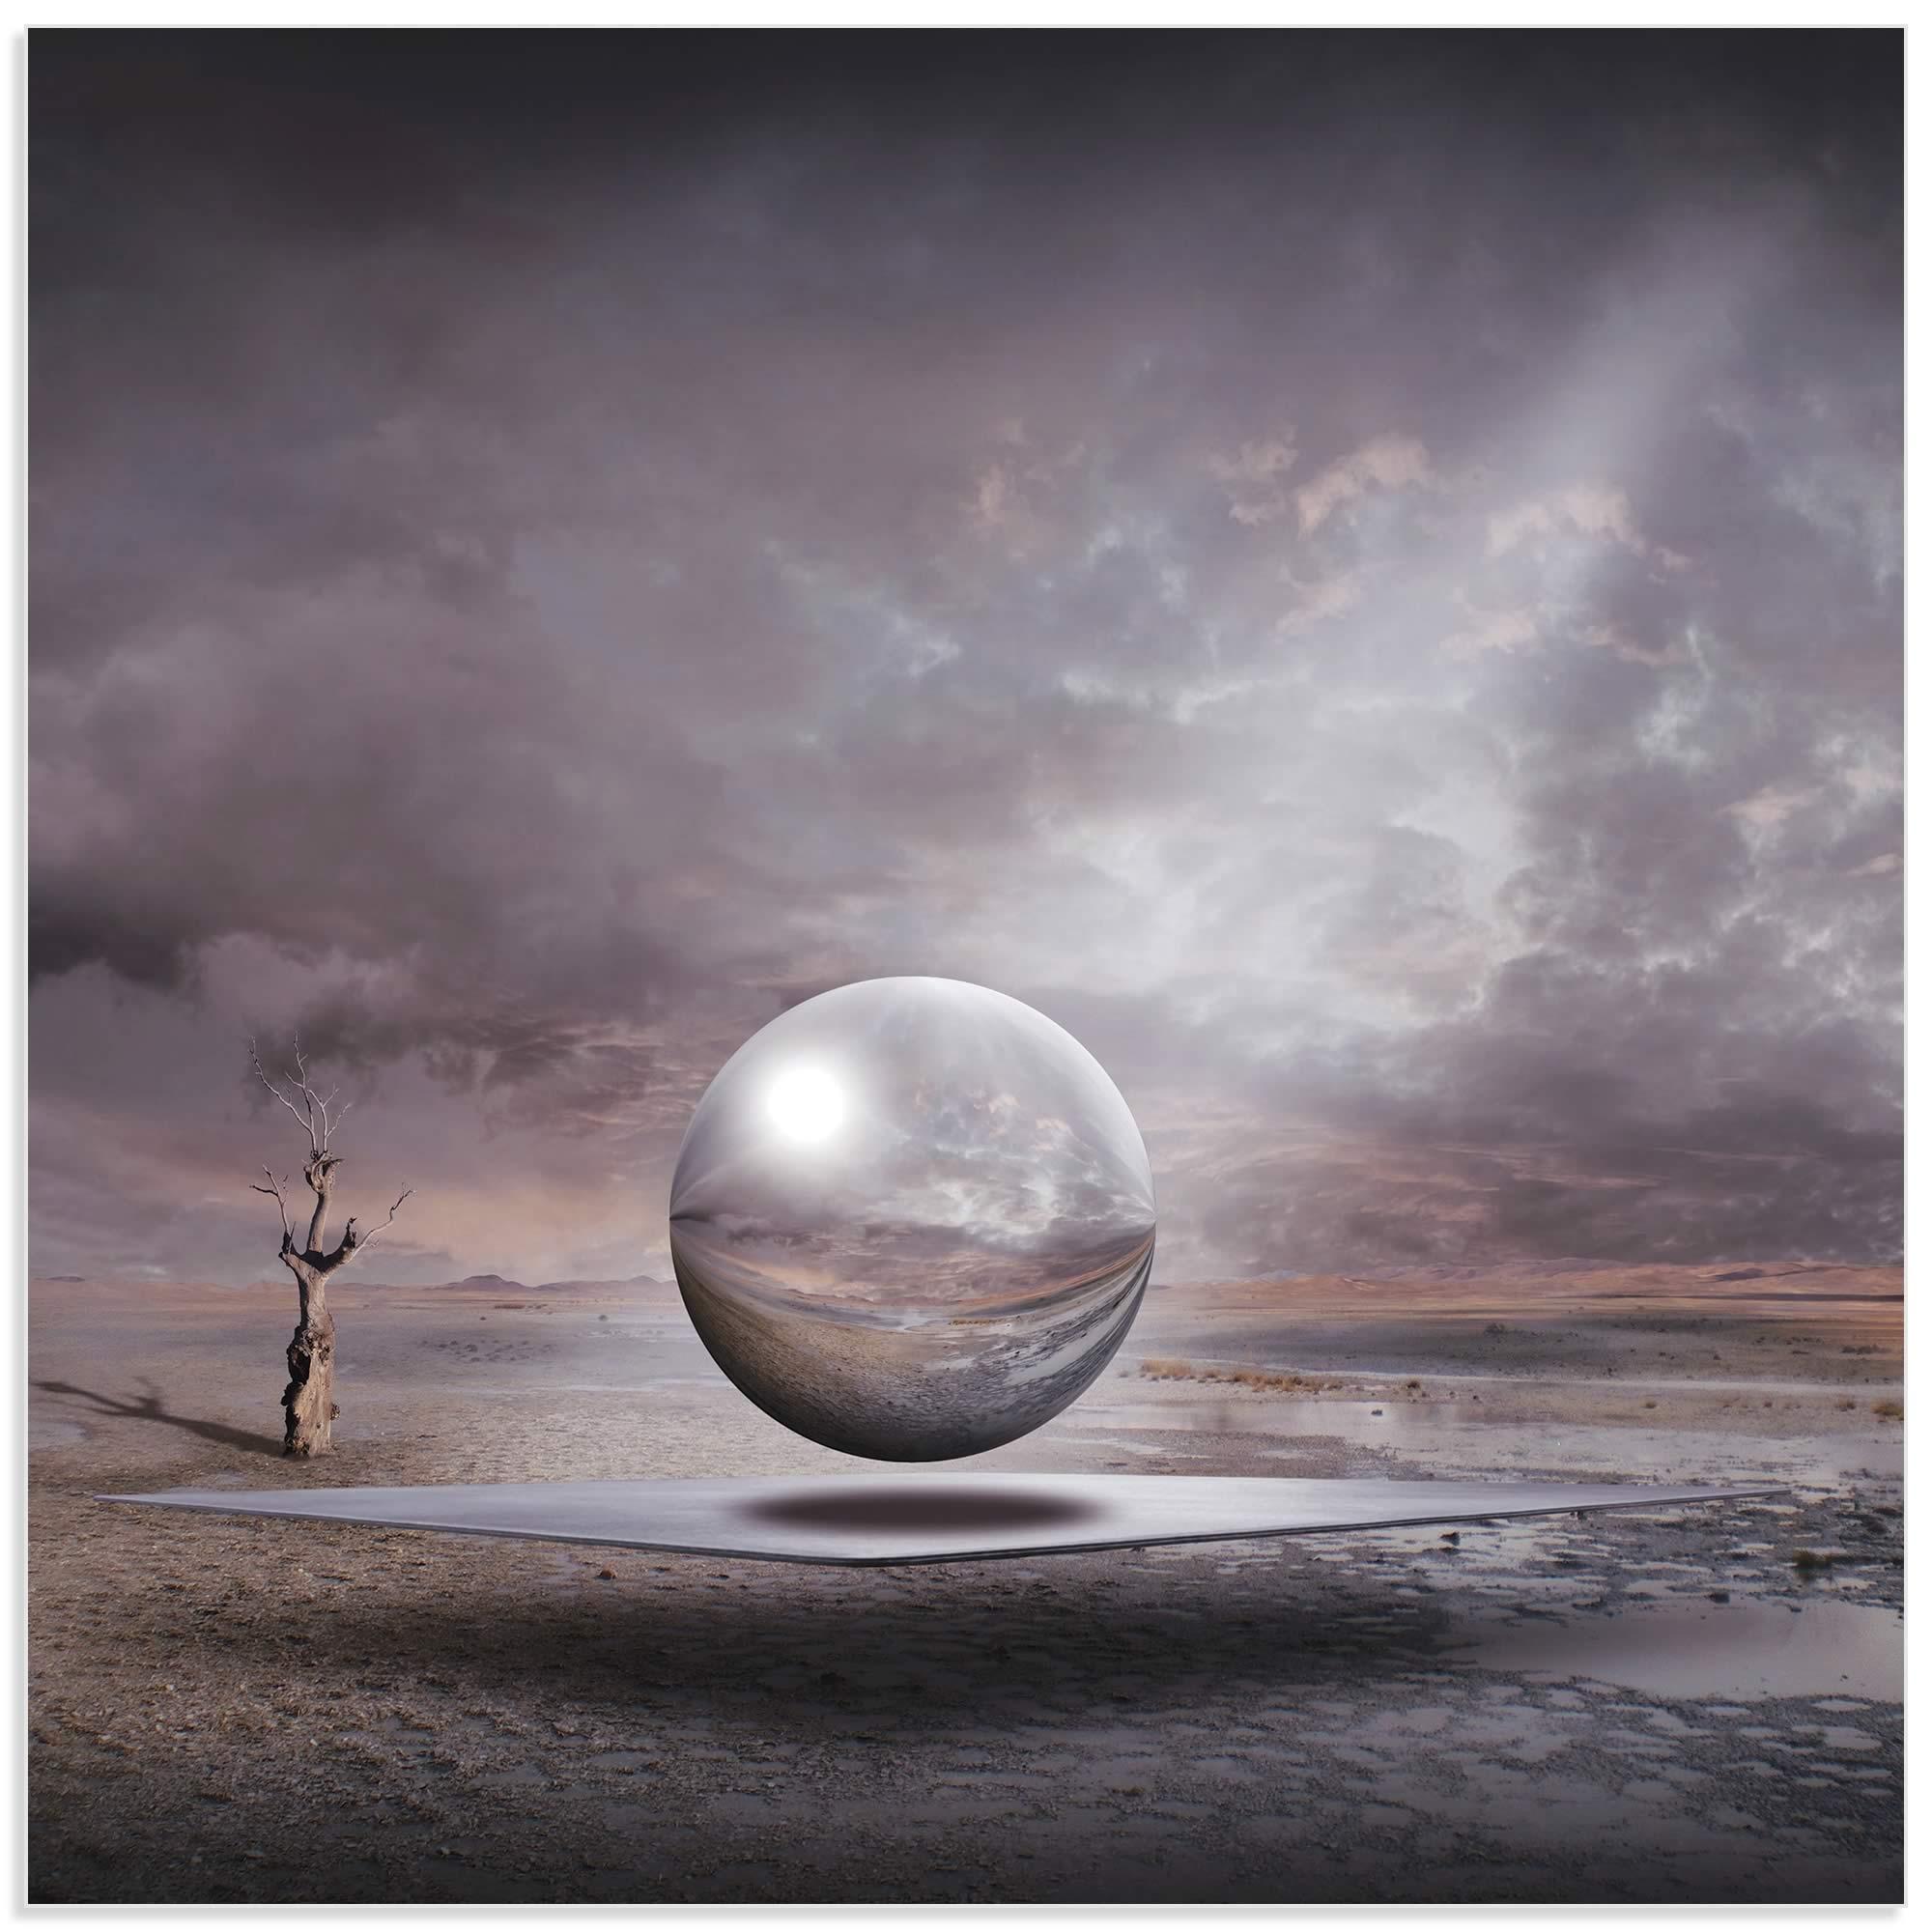 Genesis by Franziskus Pfleghart - Surrealism Art on Metal or Acrylic - Alternate View 2